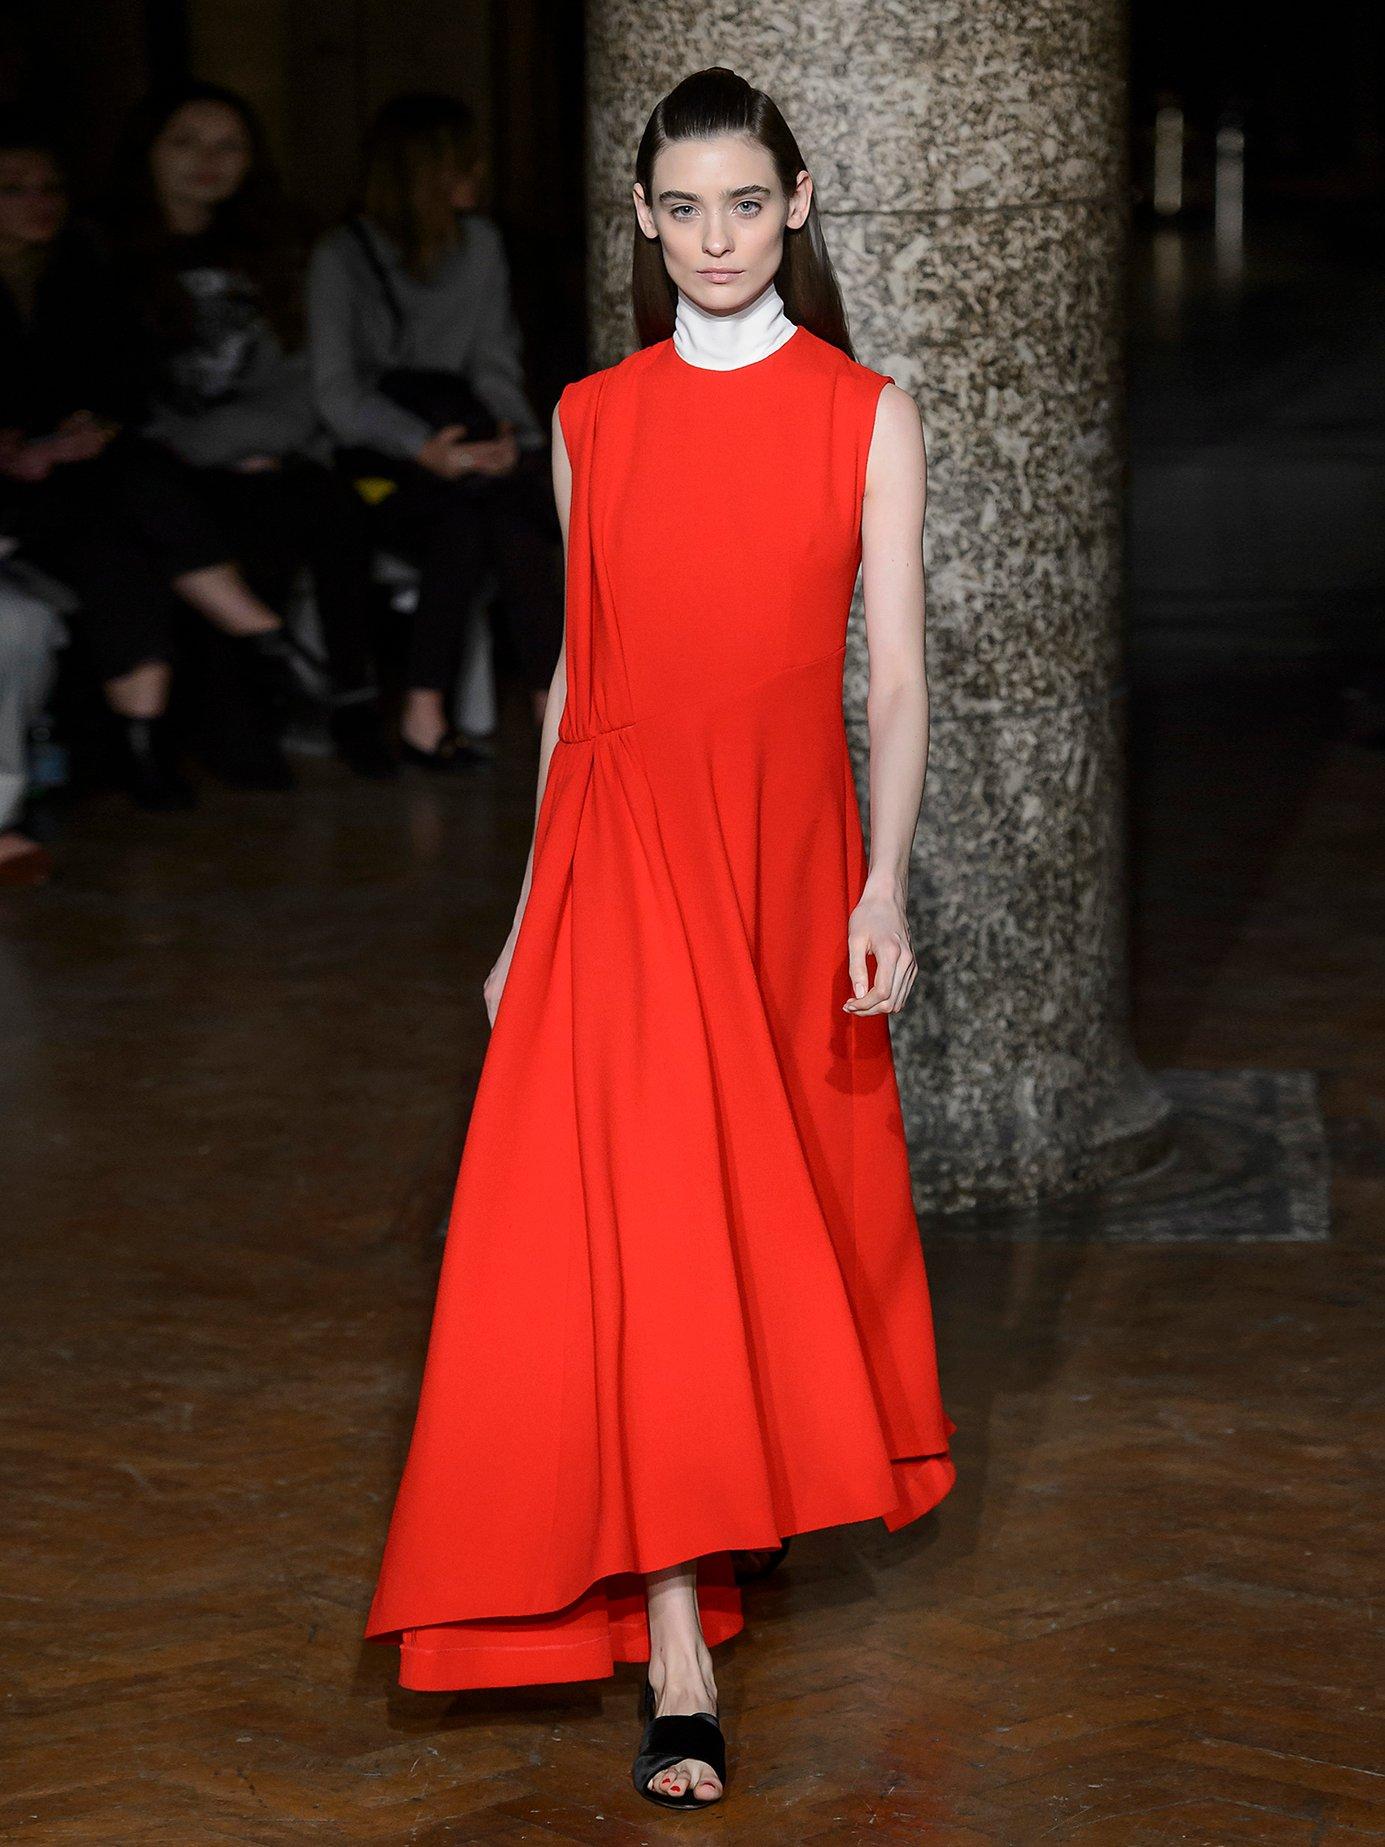 Vivian round-neck pleat-detail wool dress by Emilia Wickstead